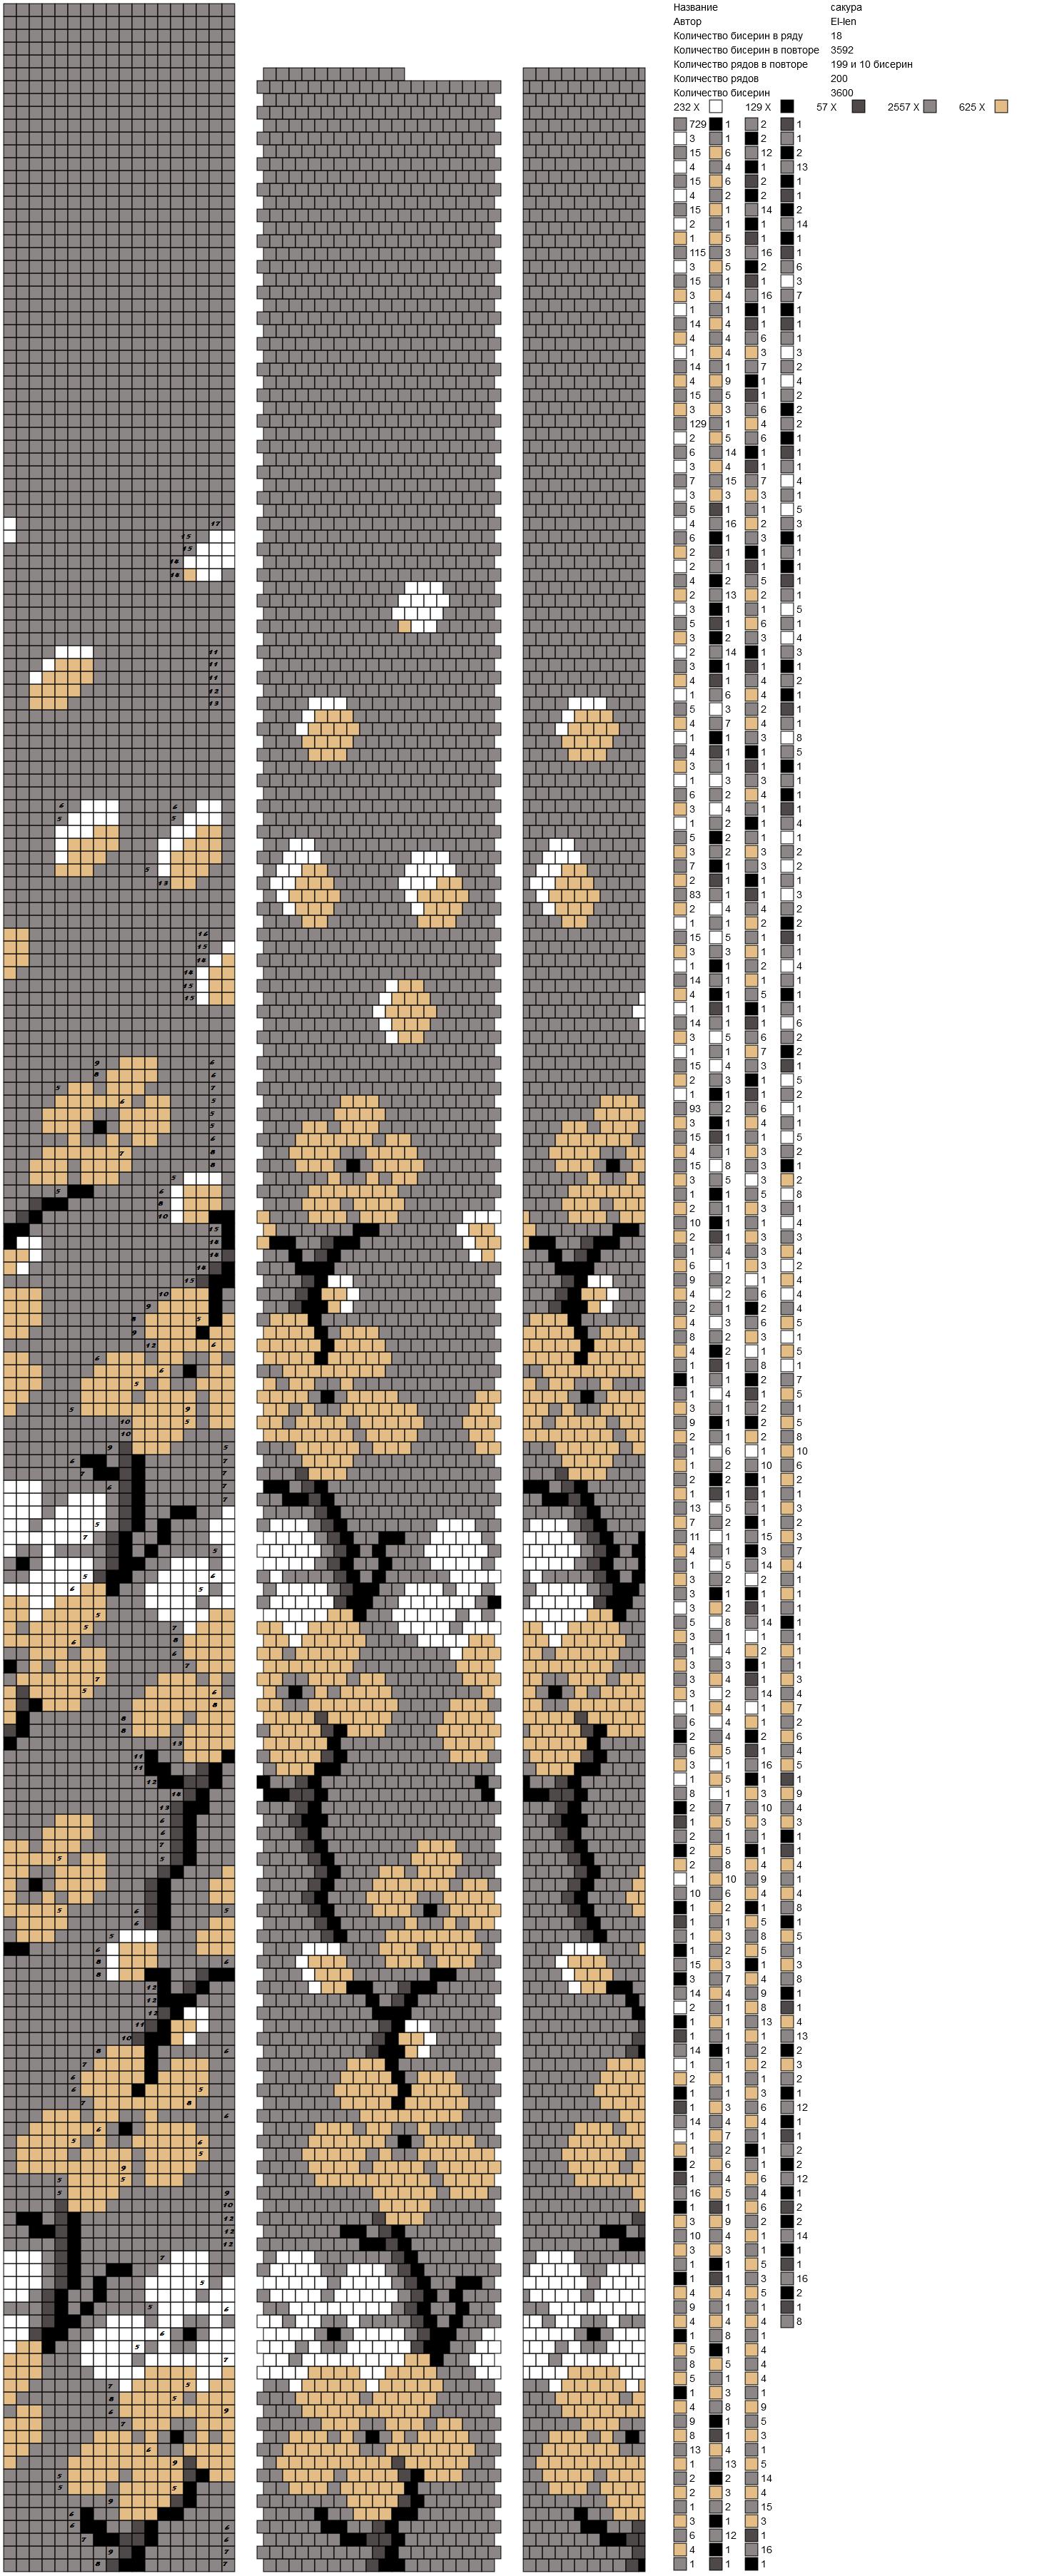 cb601a5aa266f2612faff5b8b26963ba.png (1453×3611) | Beads | Pinterest ...